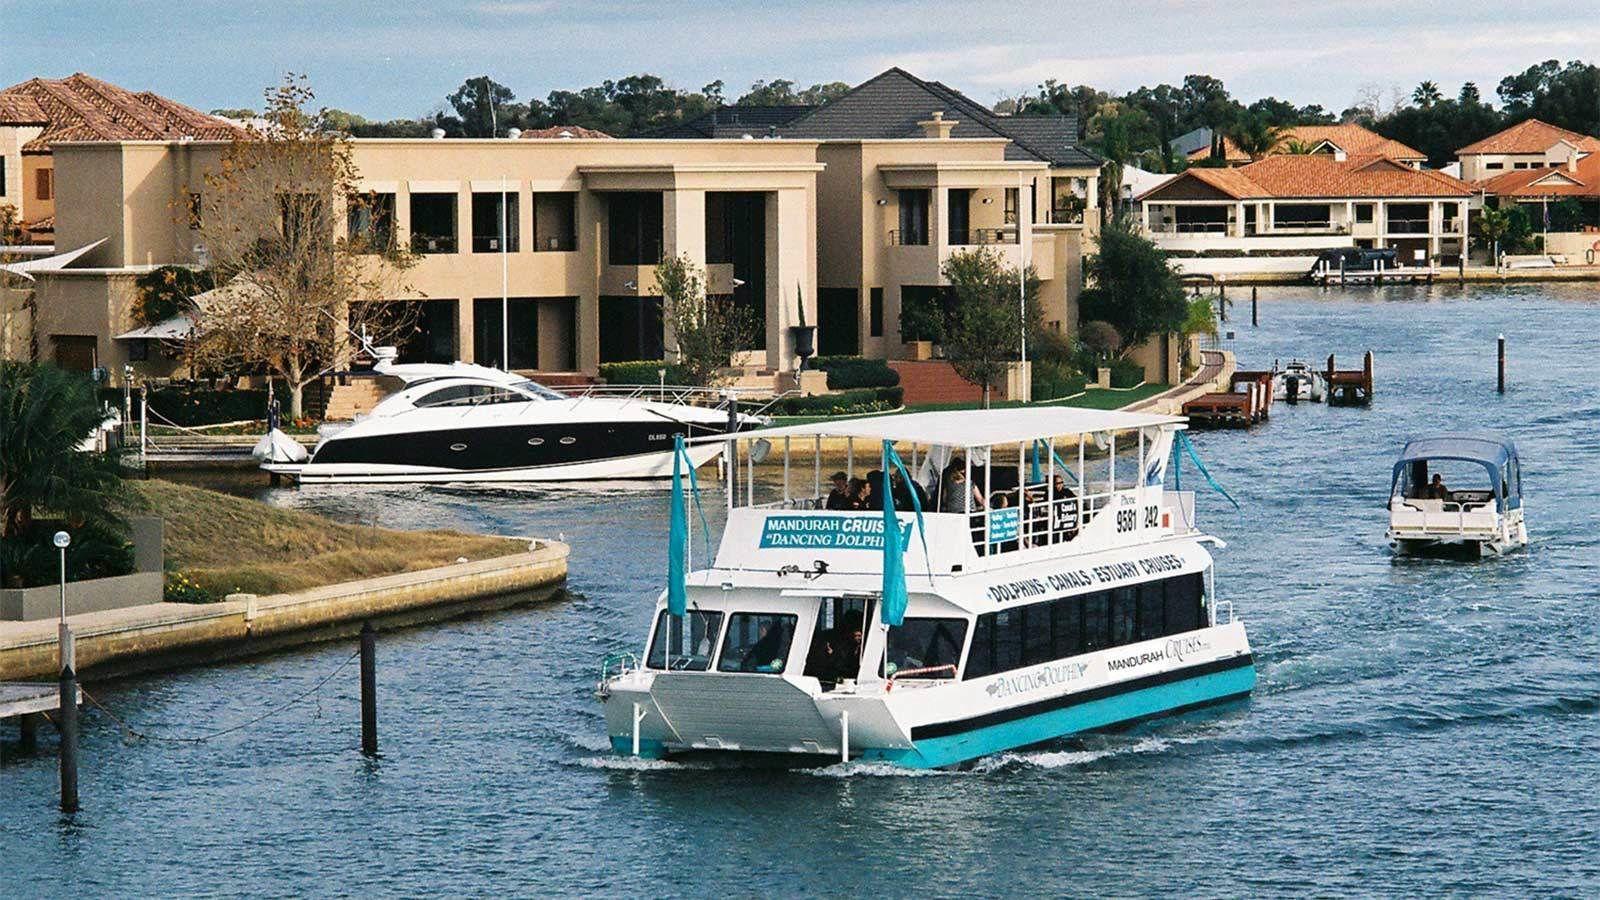 Serene view of a cruise boat in Perth, Australia